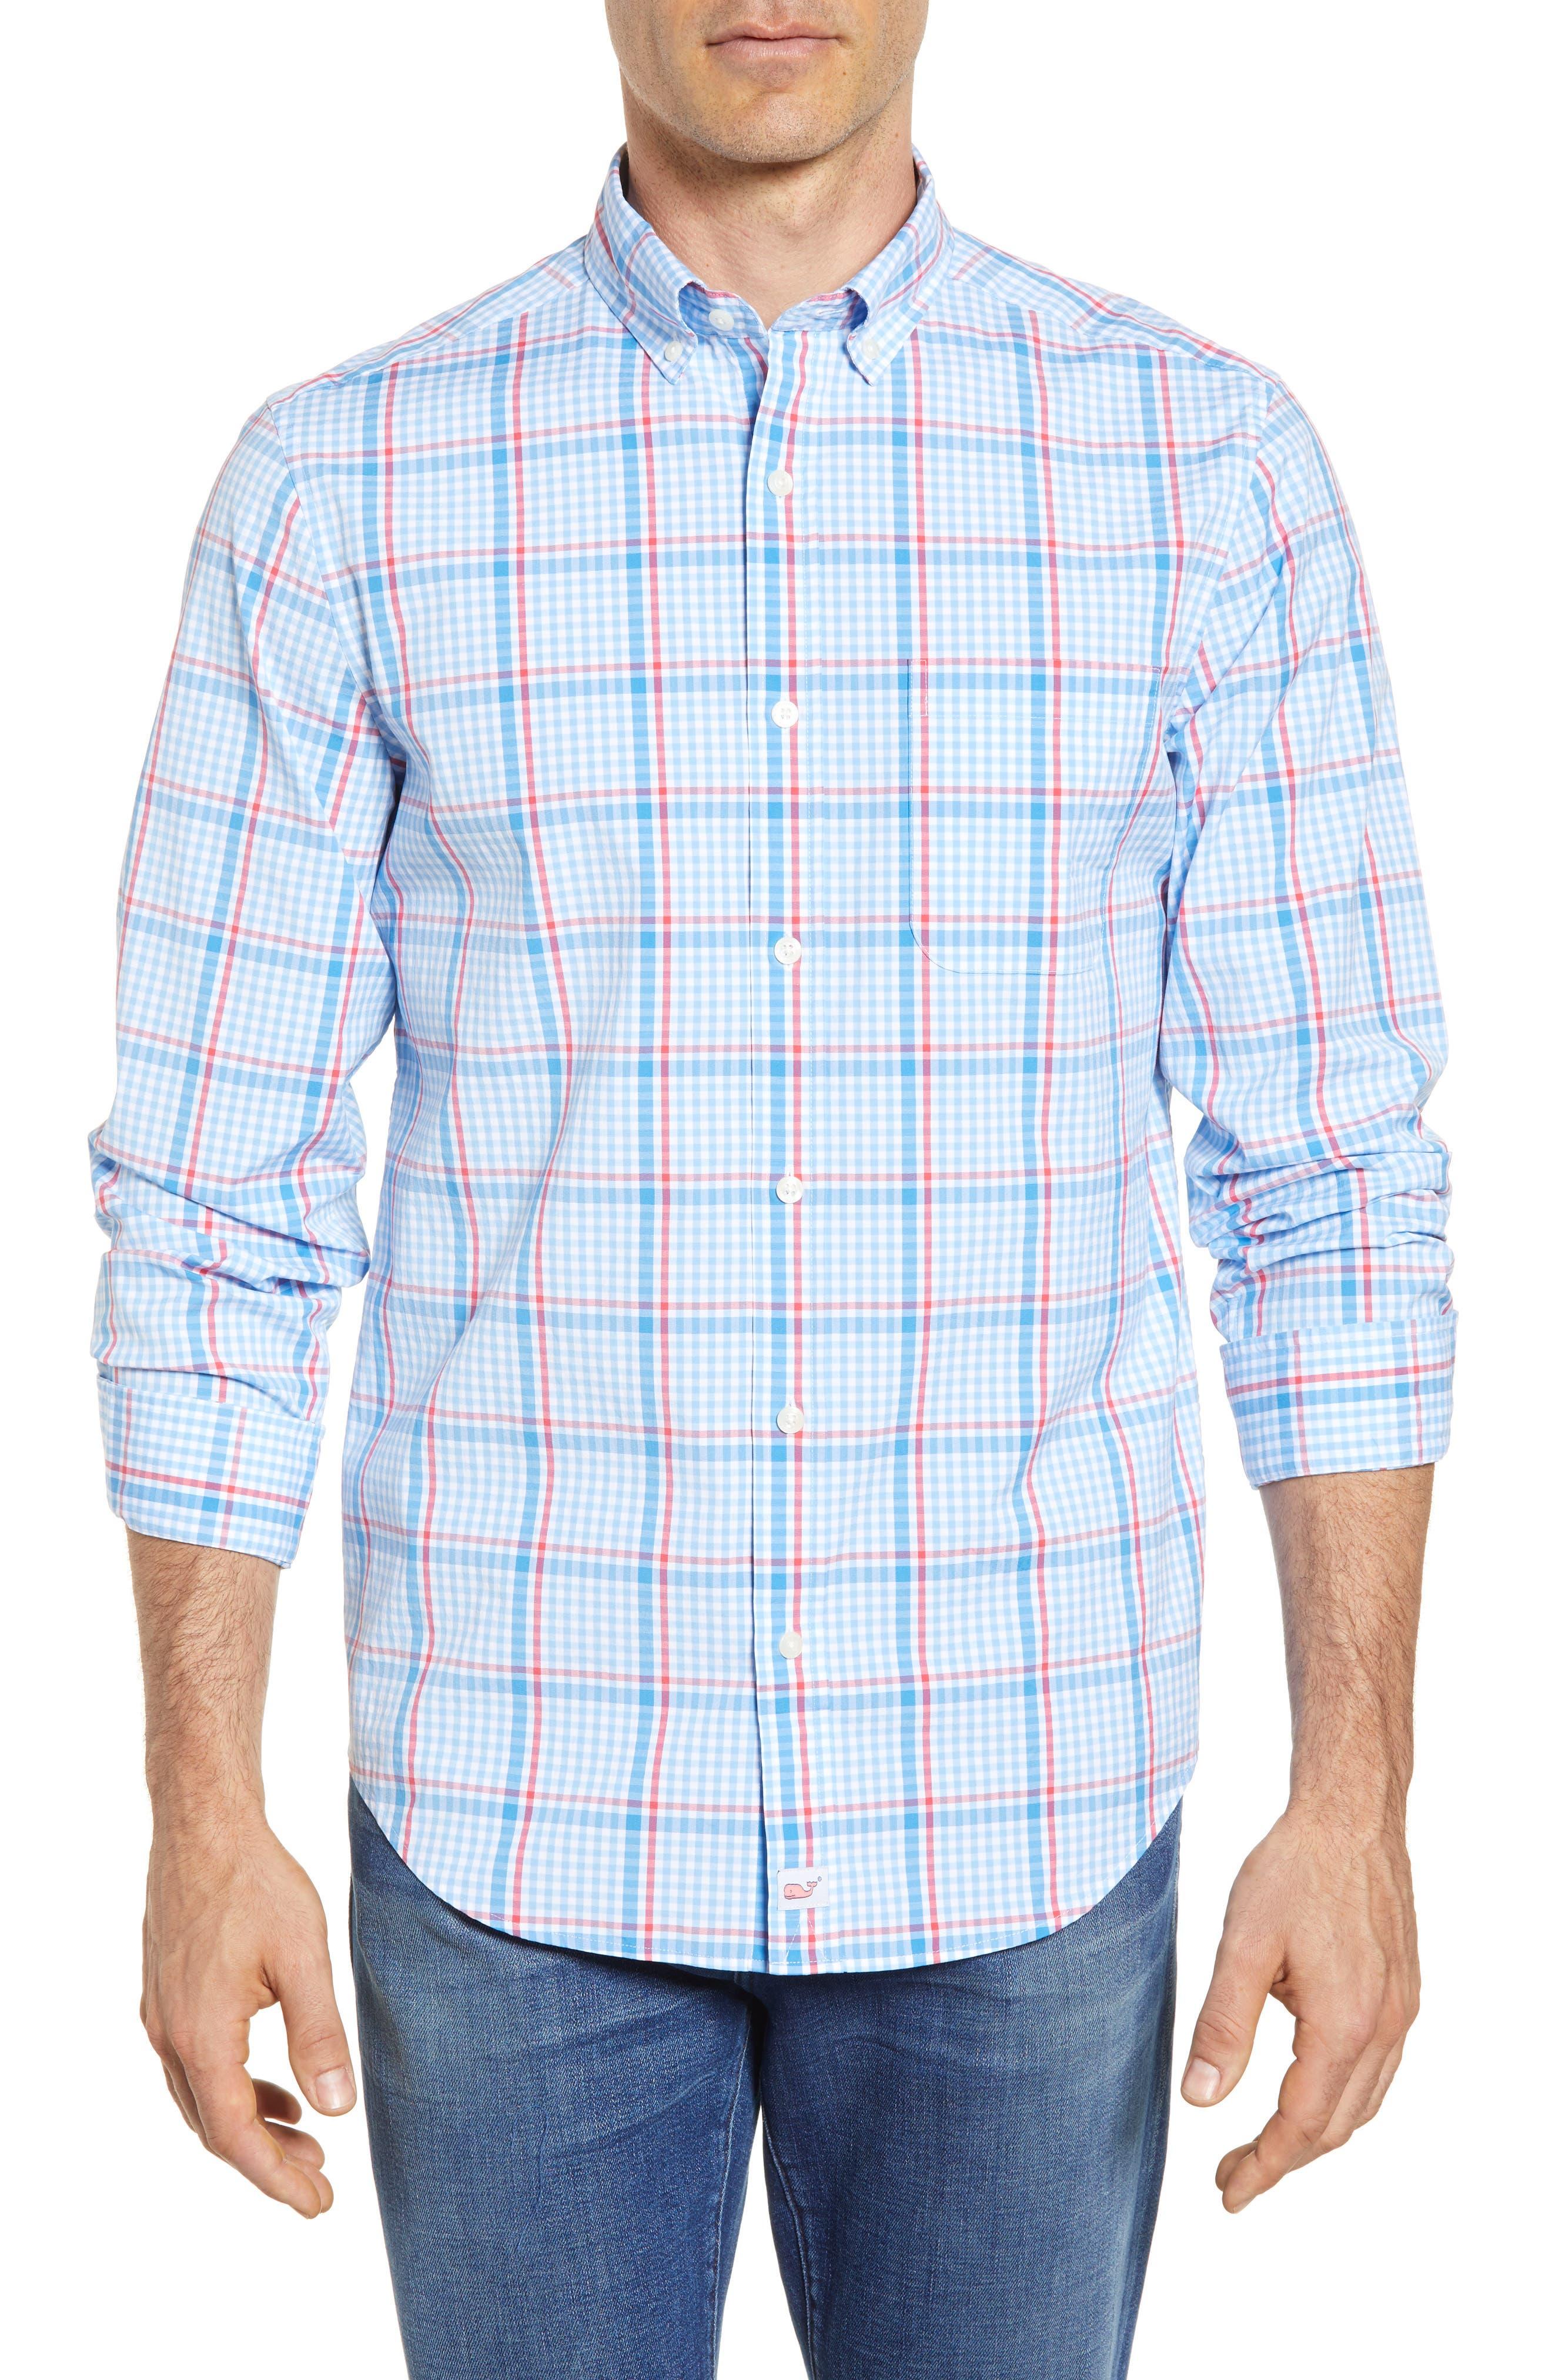 Palmer Island Classic Fit Plaid Sport Shirt,                         Main,                         color, Ocean Breeze